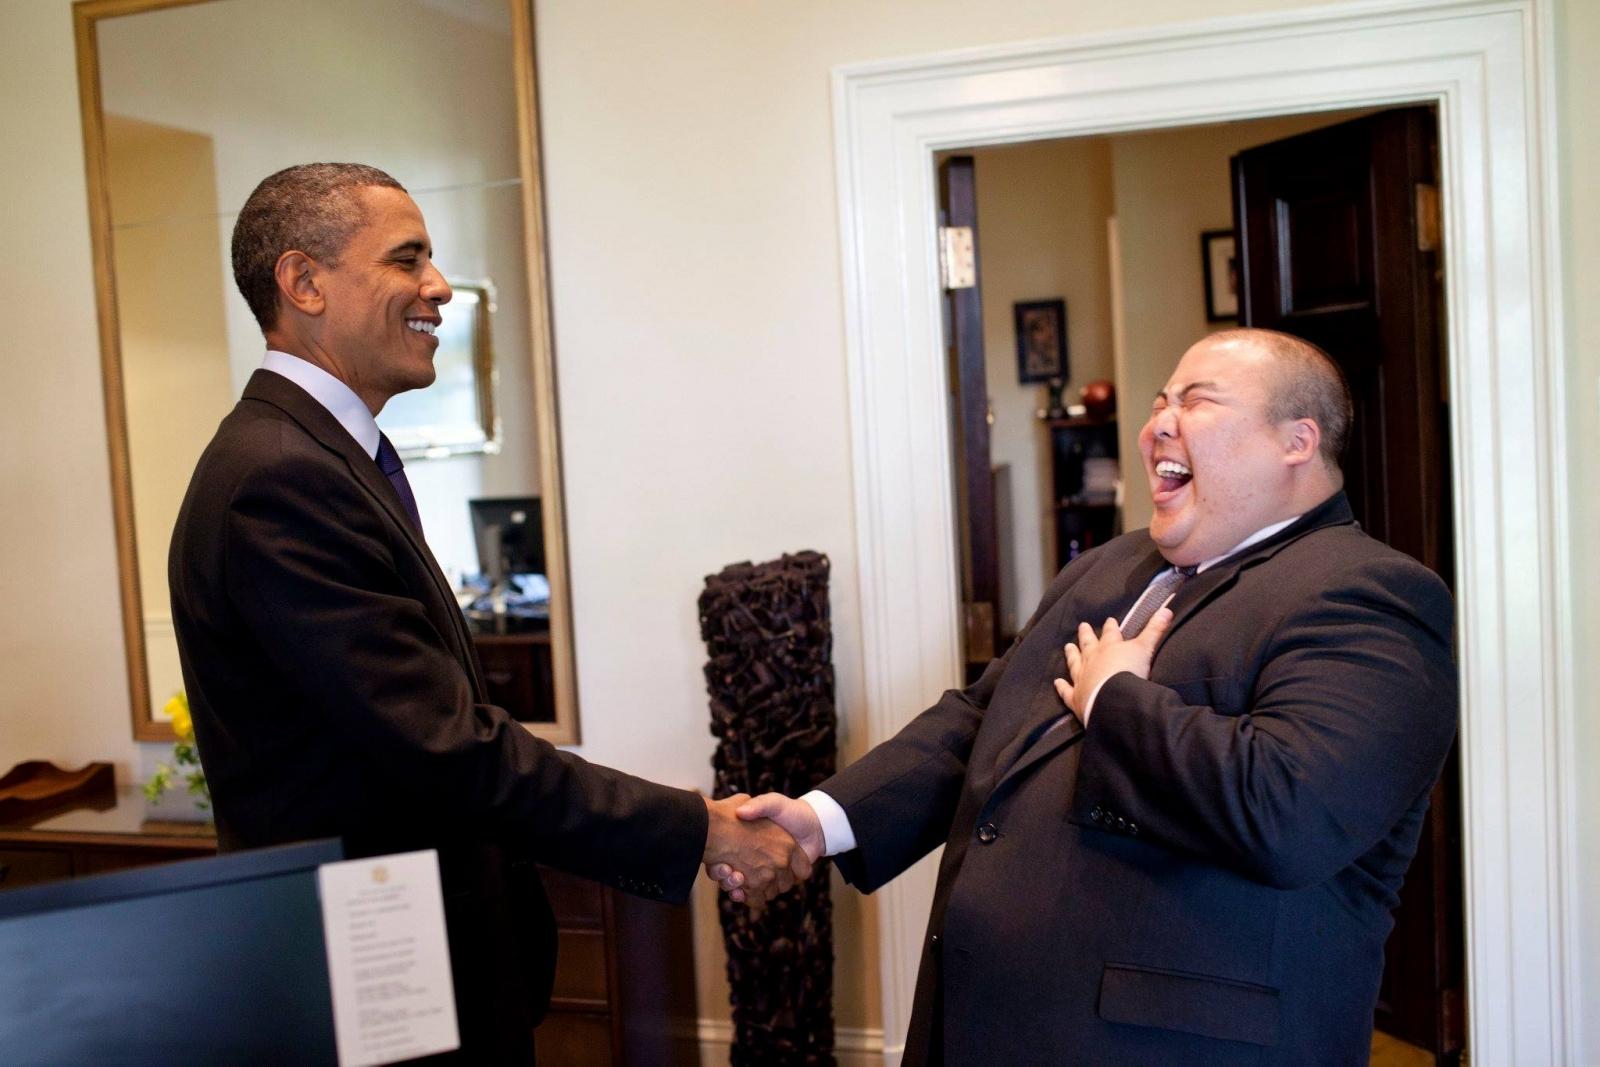 Obama and Gary Lee